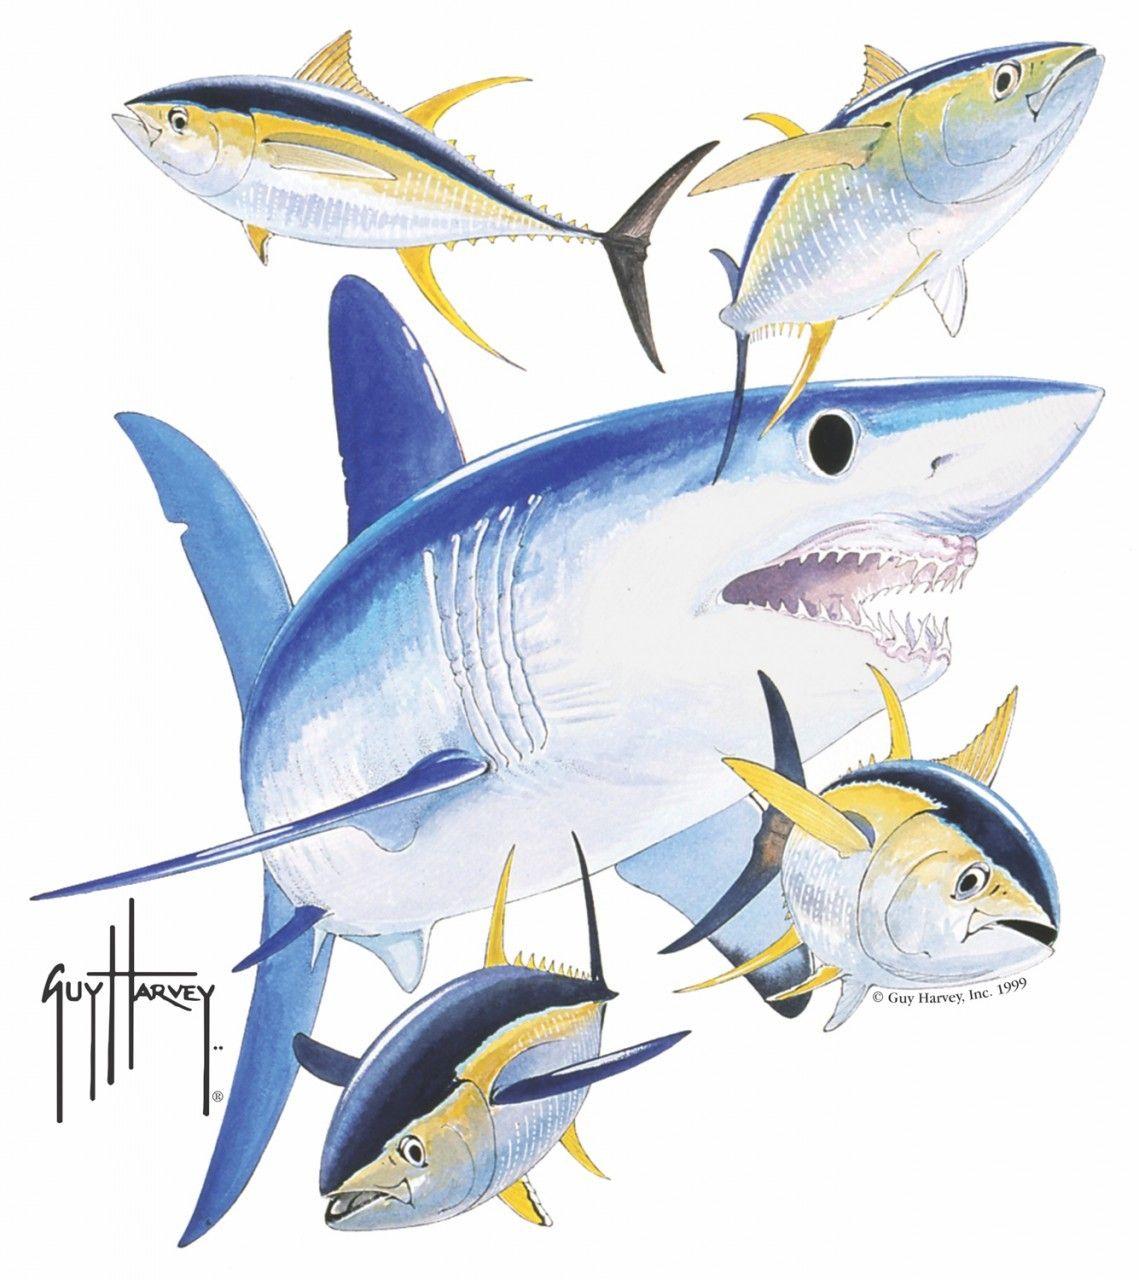 Guy Harvey Shirts - Guy Harvey Mako Shark Window Decal 933de24279cf